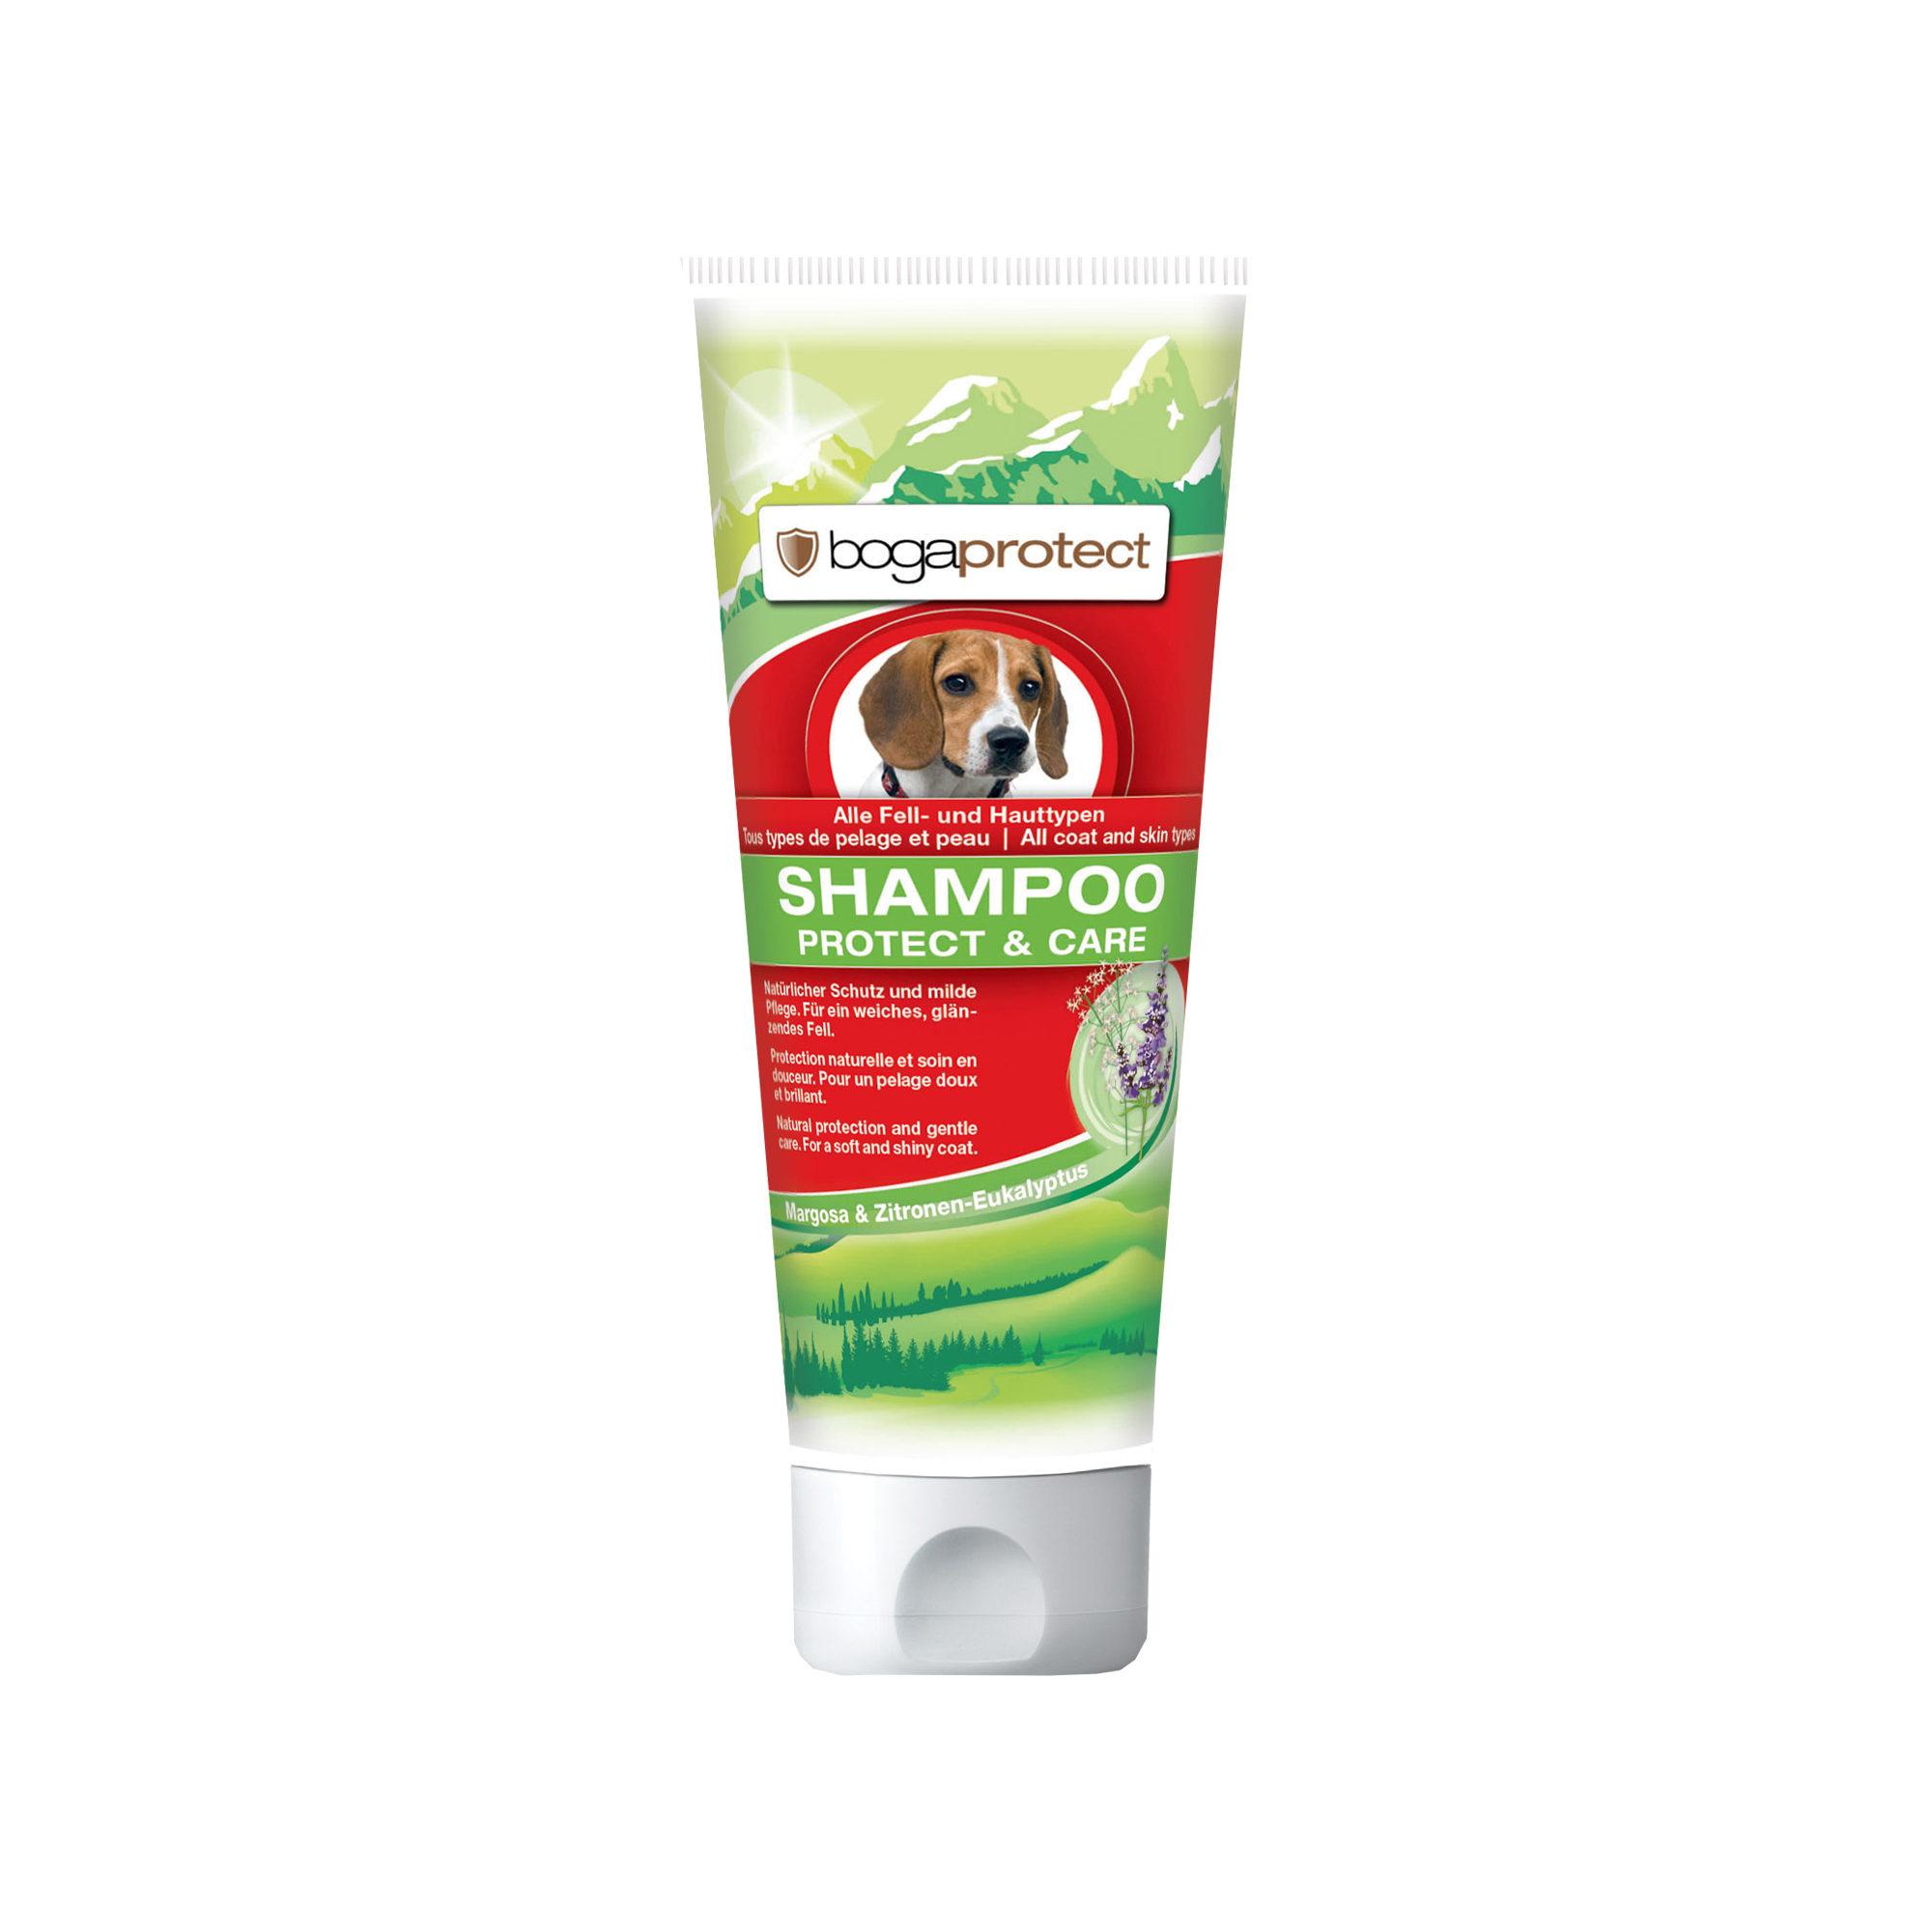 Bogaprotect Shampoo Protect & Care